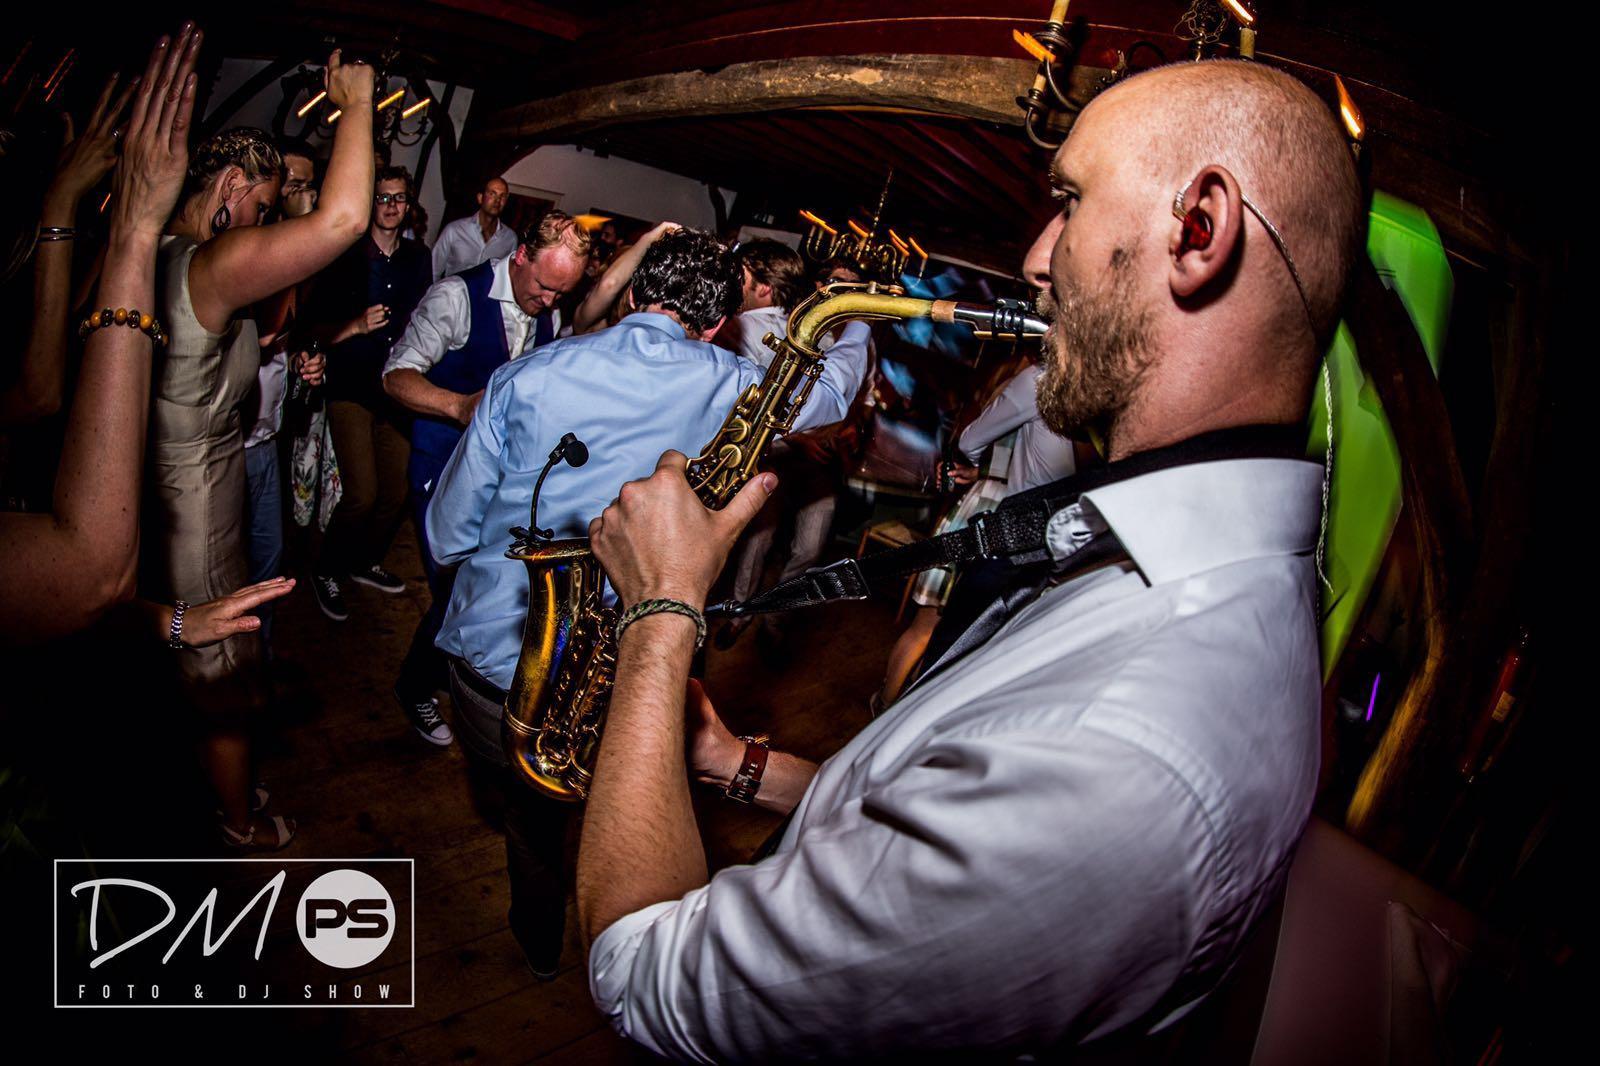 tim bakker saxofoon